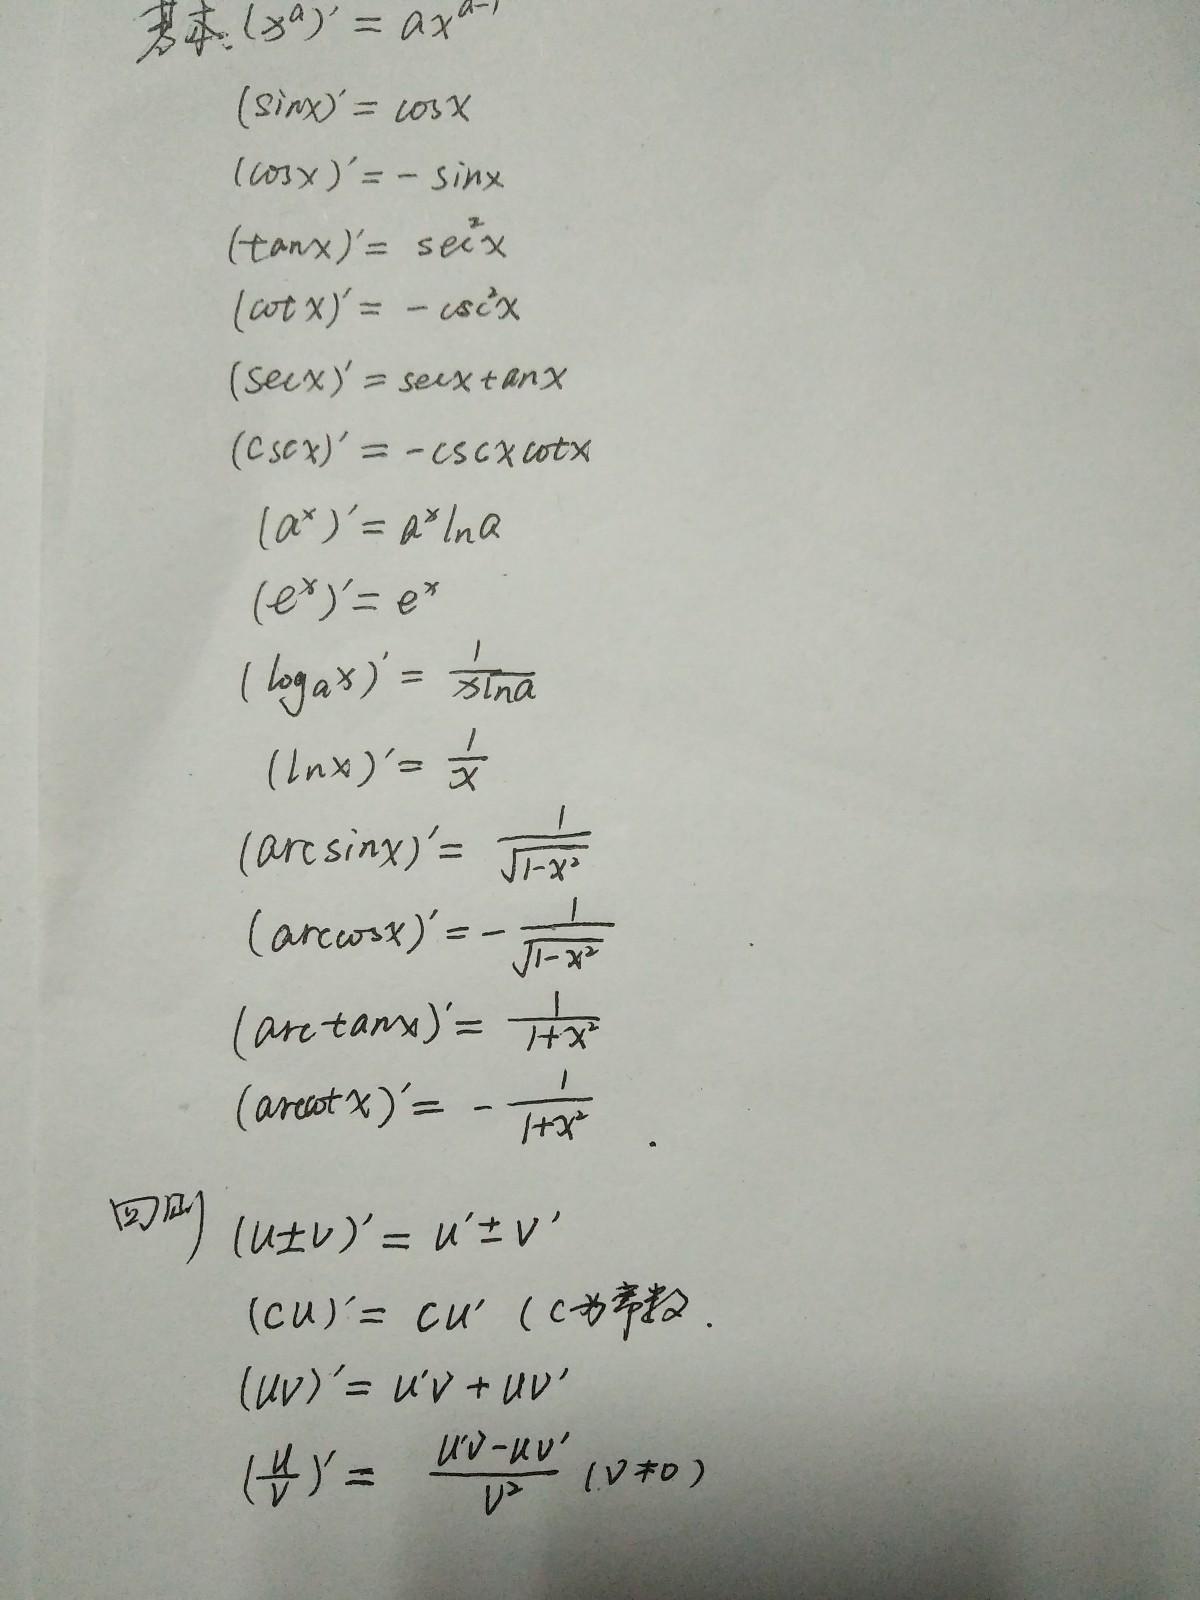 的很性感]�$y��i�i�ZyZyy�F%_y2x求导-y=arctan2x求导_y=e2x求导_y=2x求导_y=ln^2x求导_y=2x/1+x^2求导